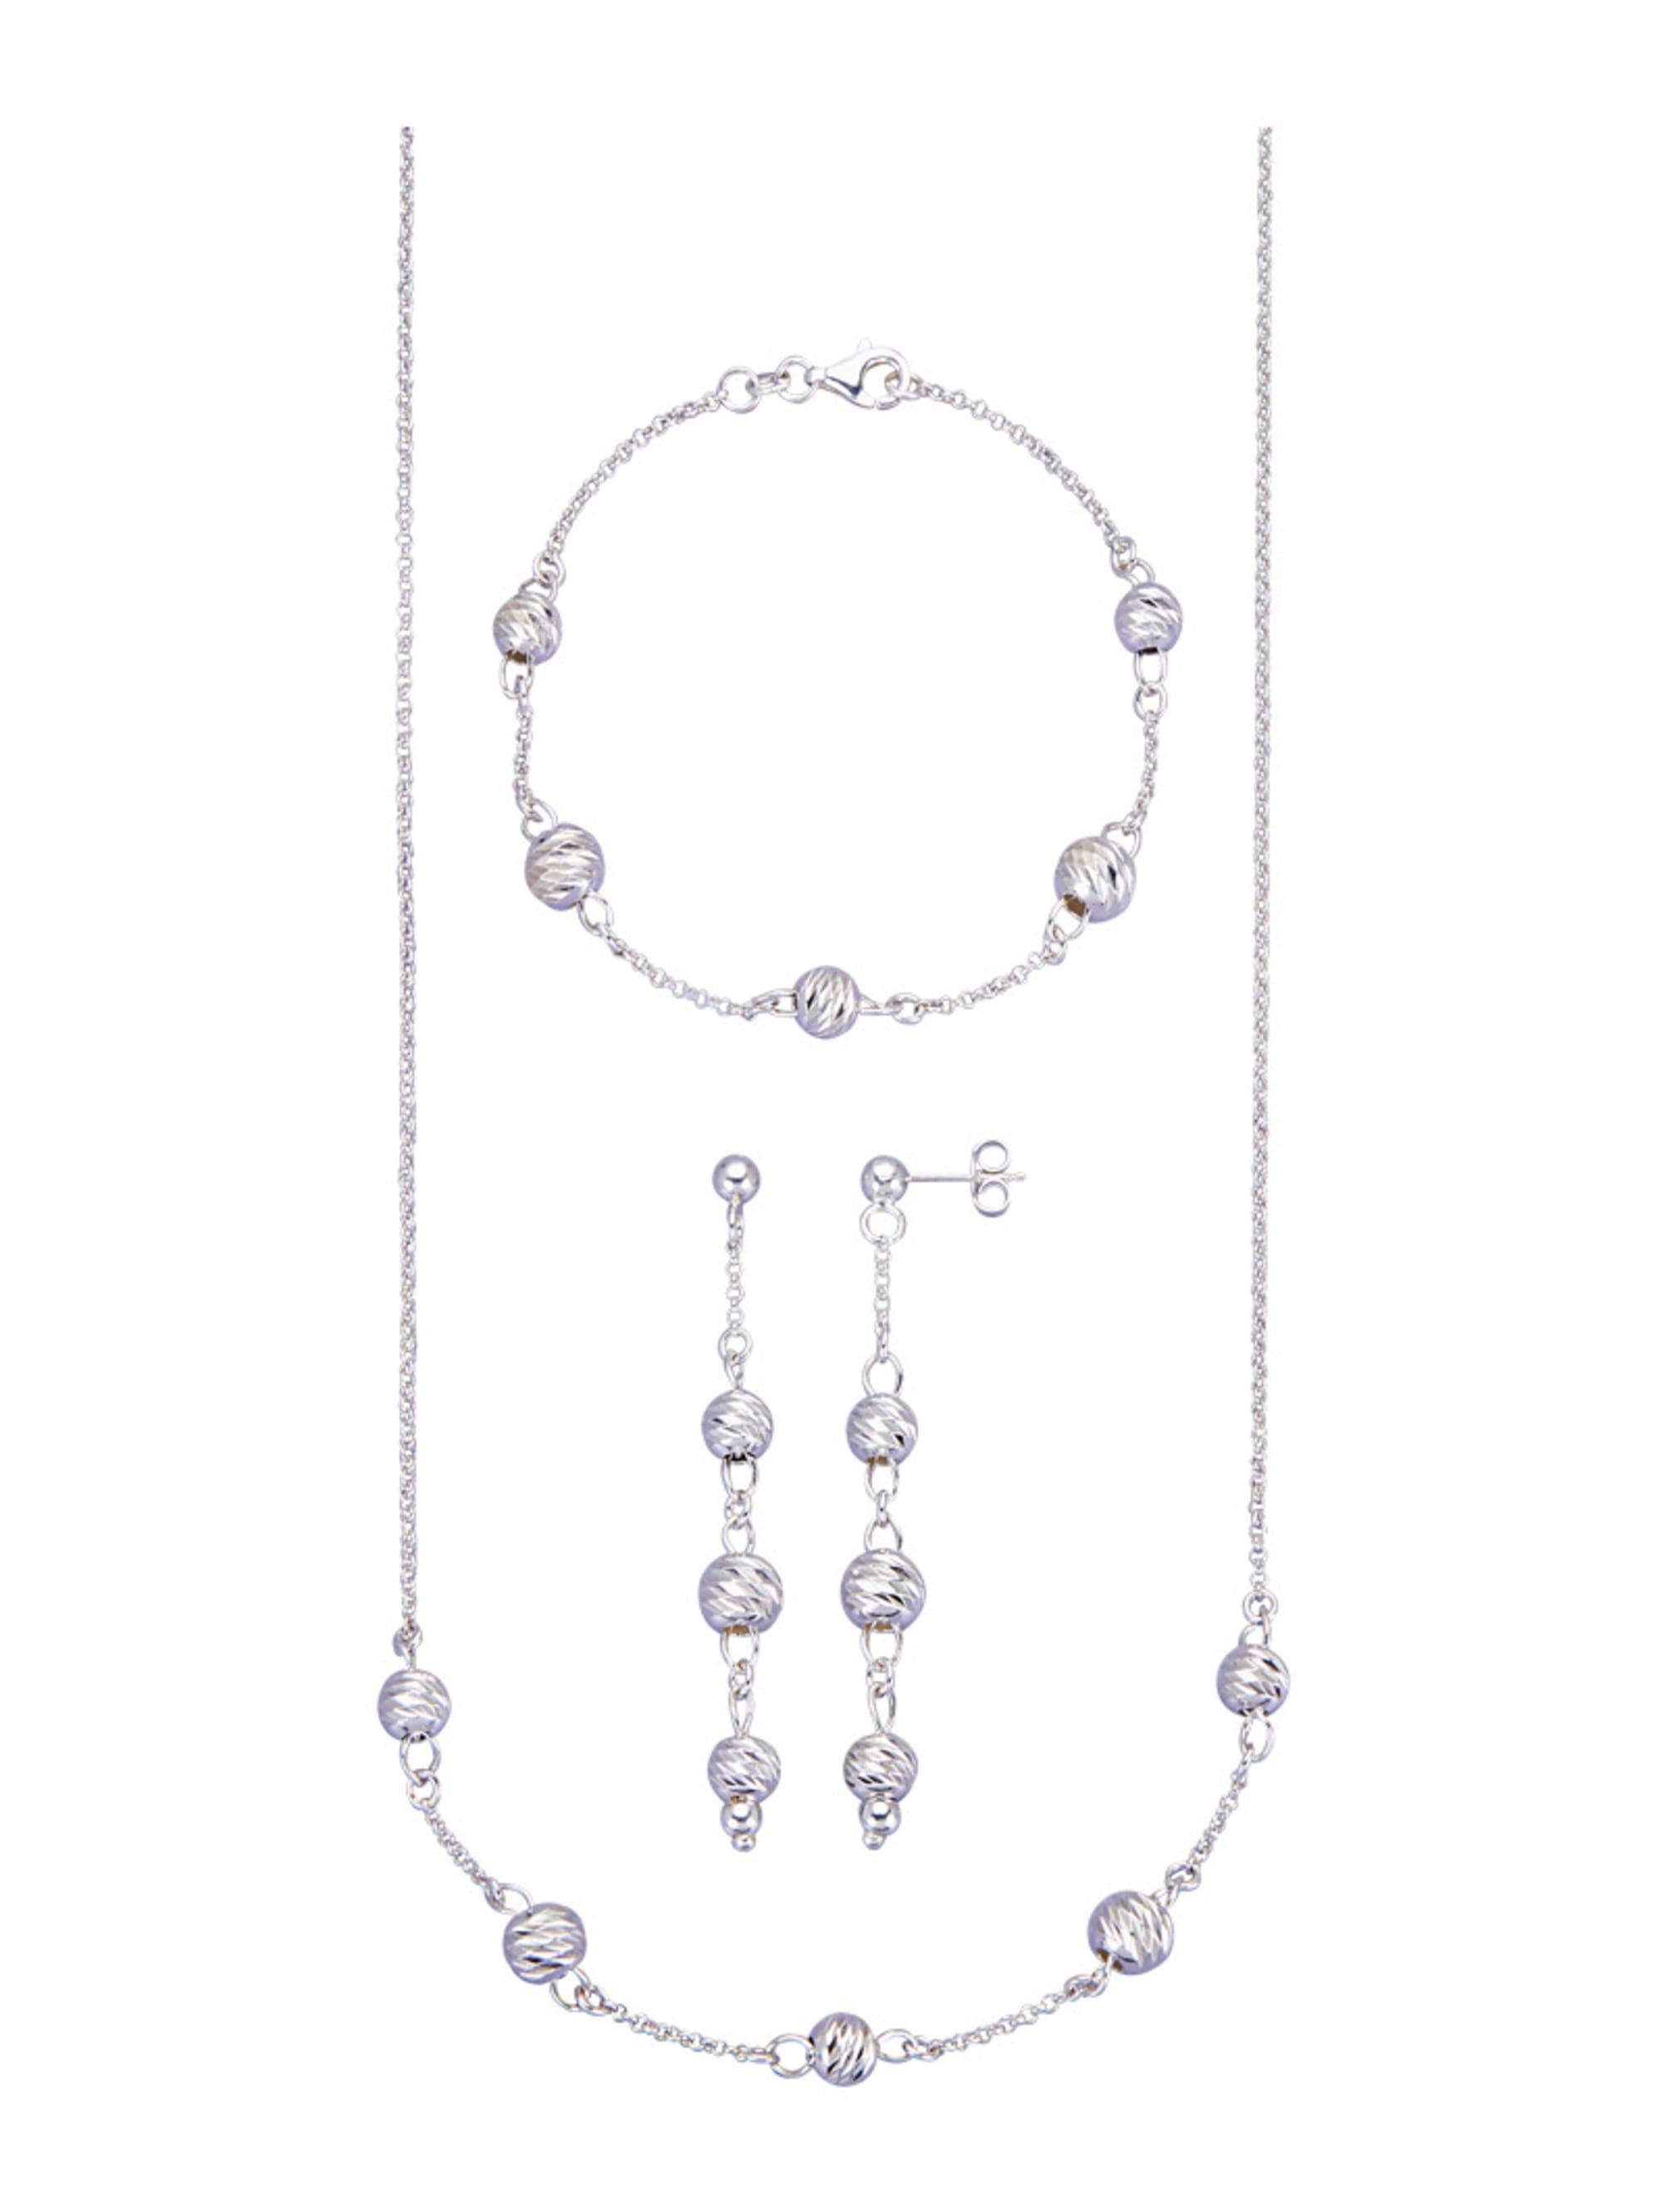 3tlg. Schmuck-Set in Silber 925 fAlfY